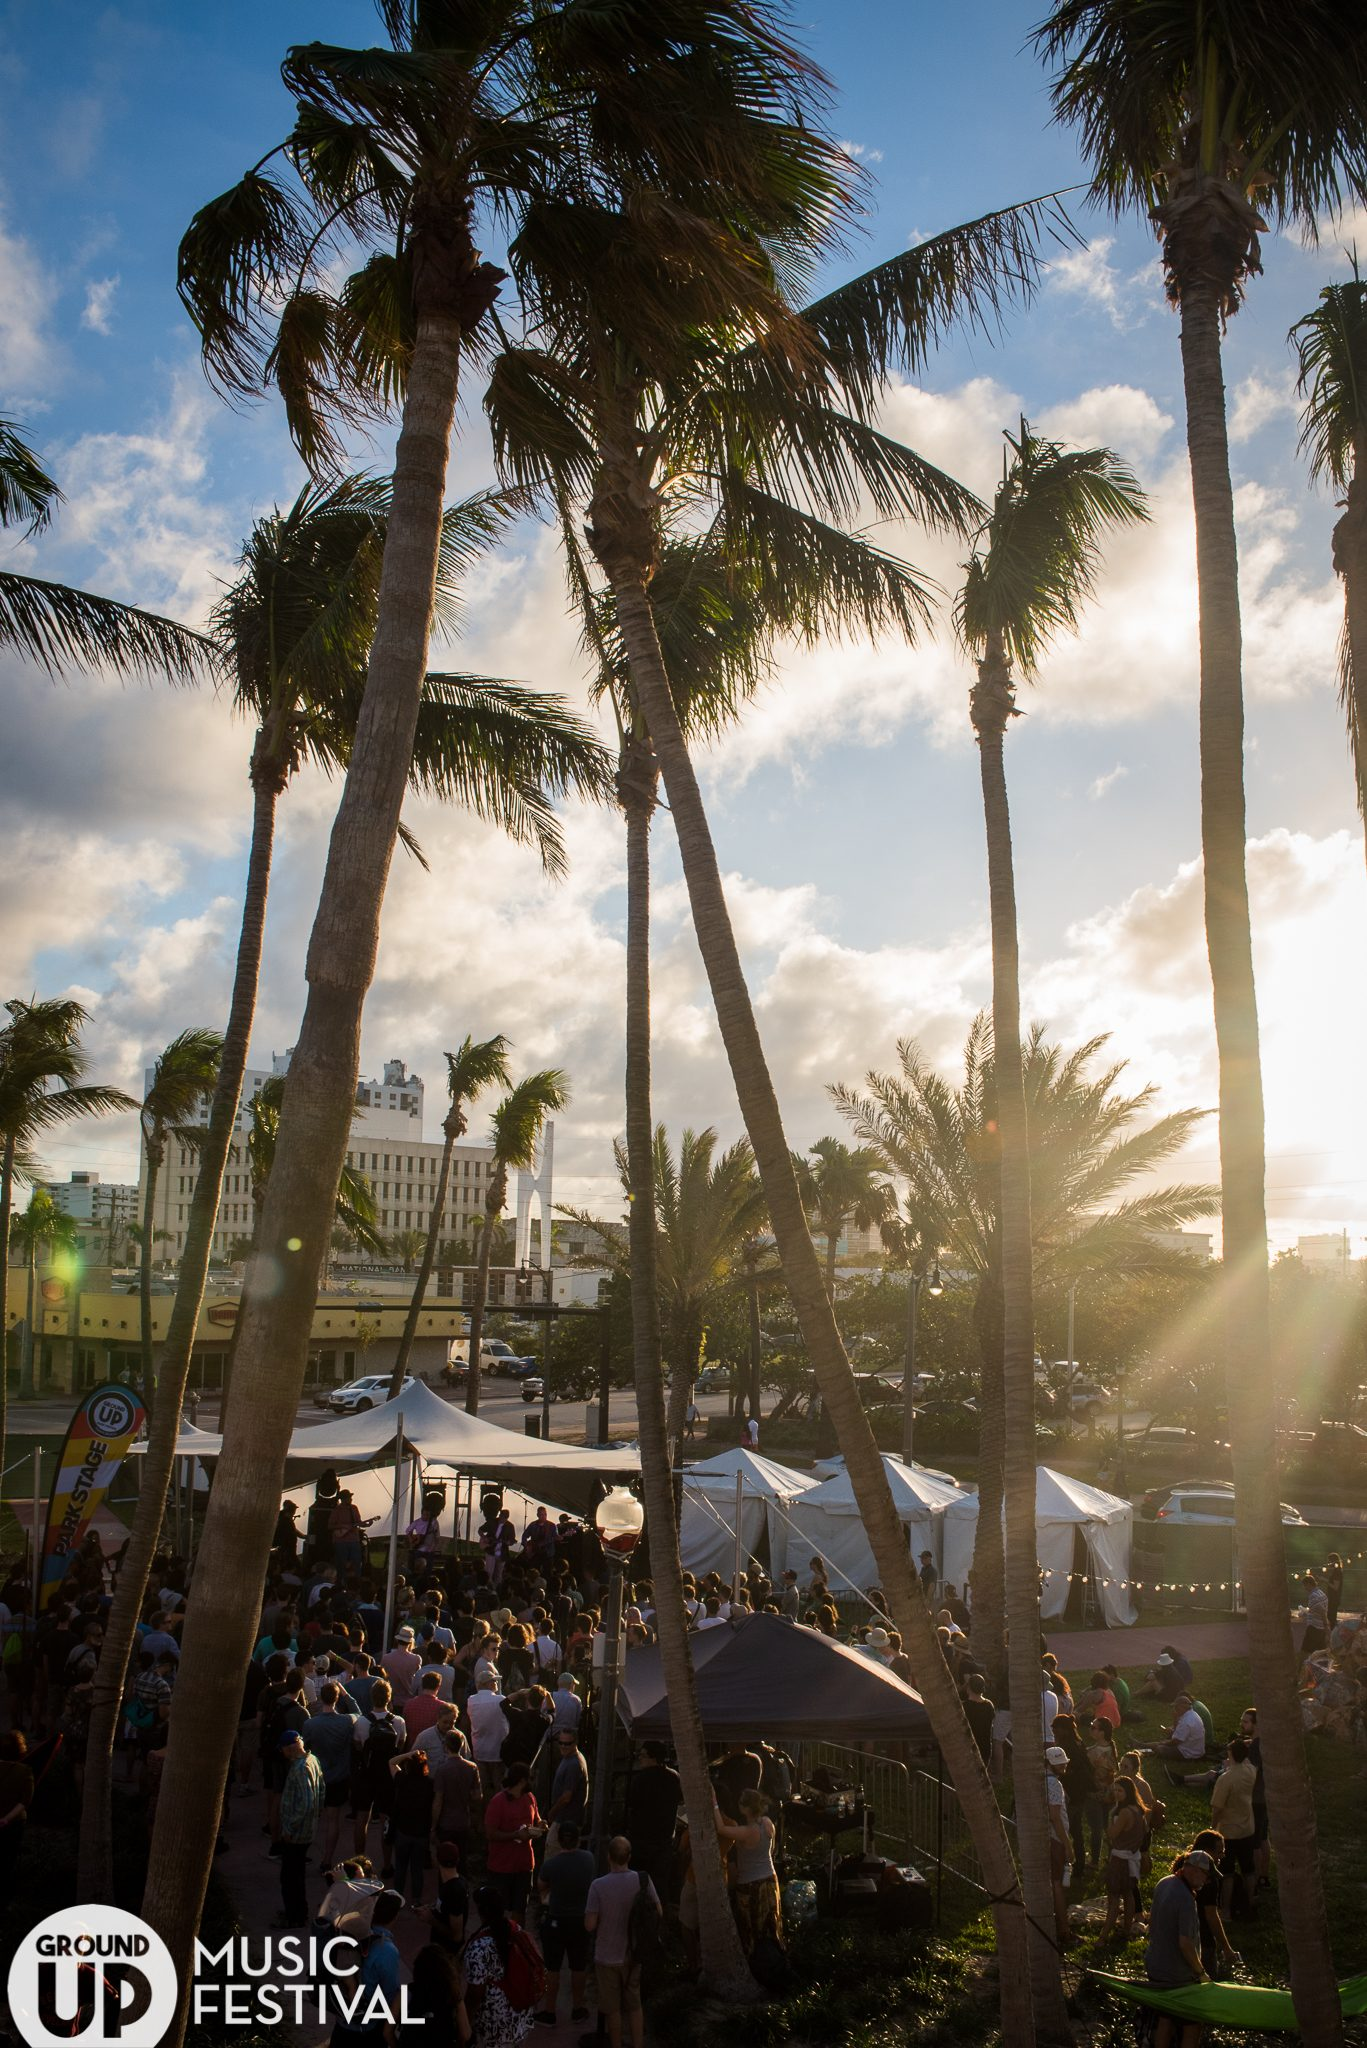 GroundUP Music Festival in Miami